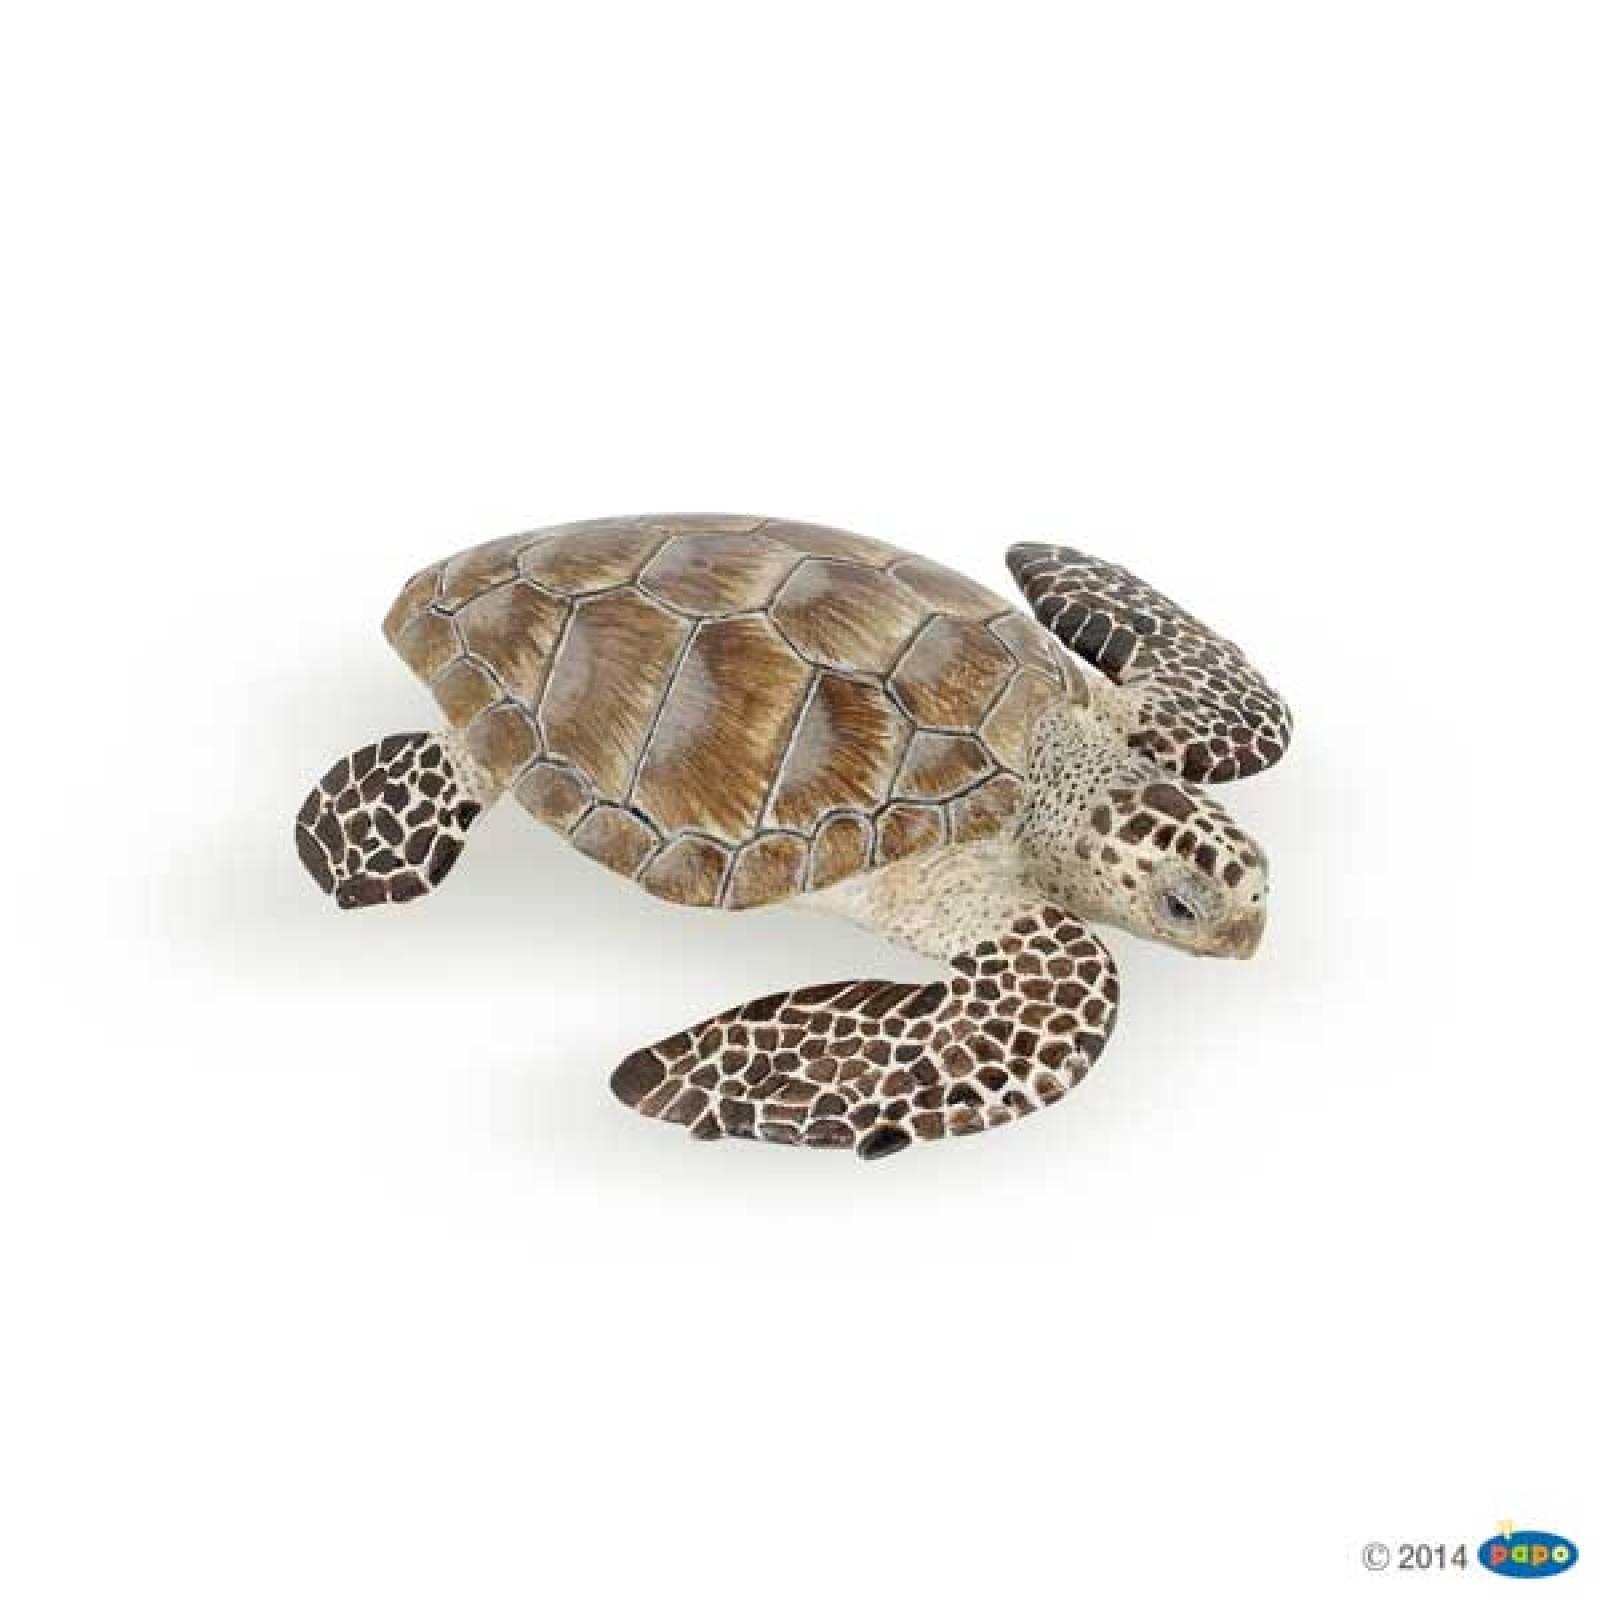 Loggerhead Turtle PAPO WILD ANIMAL